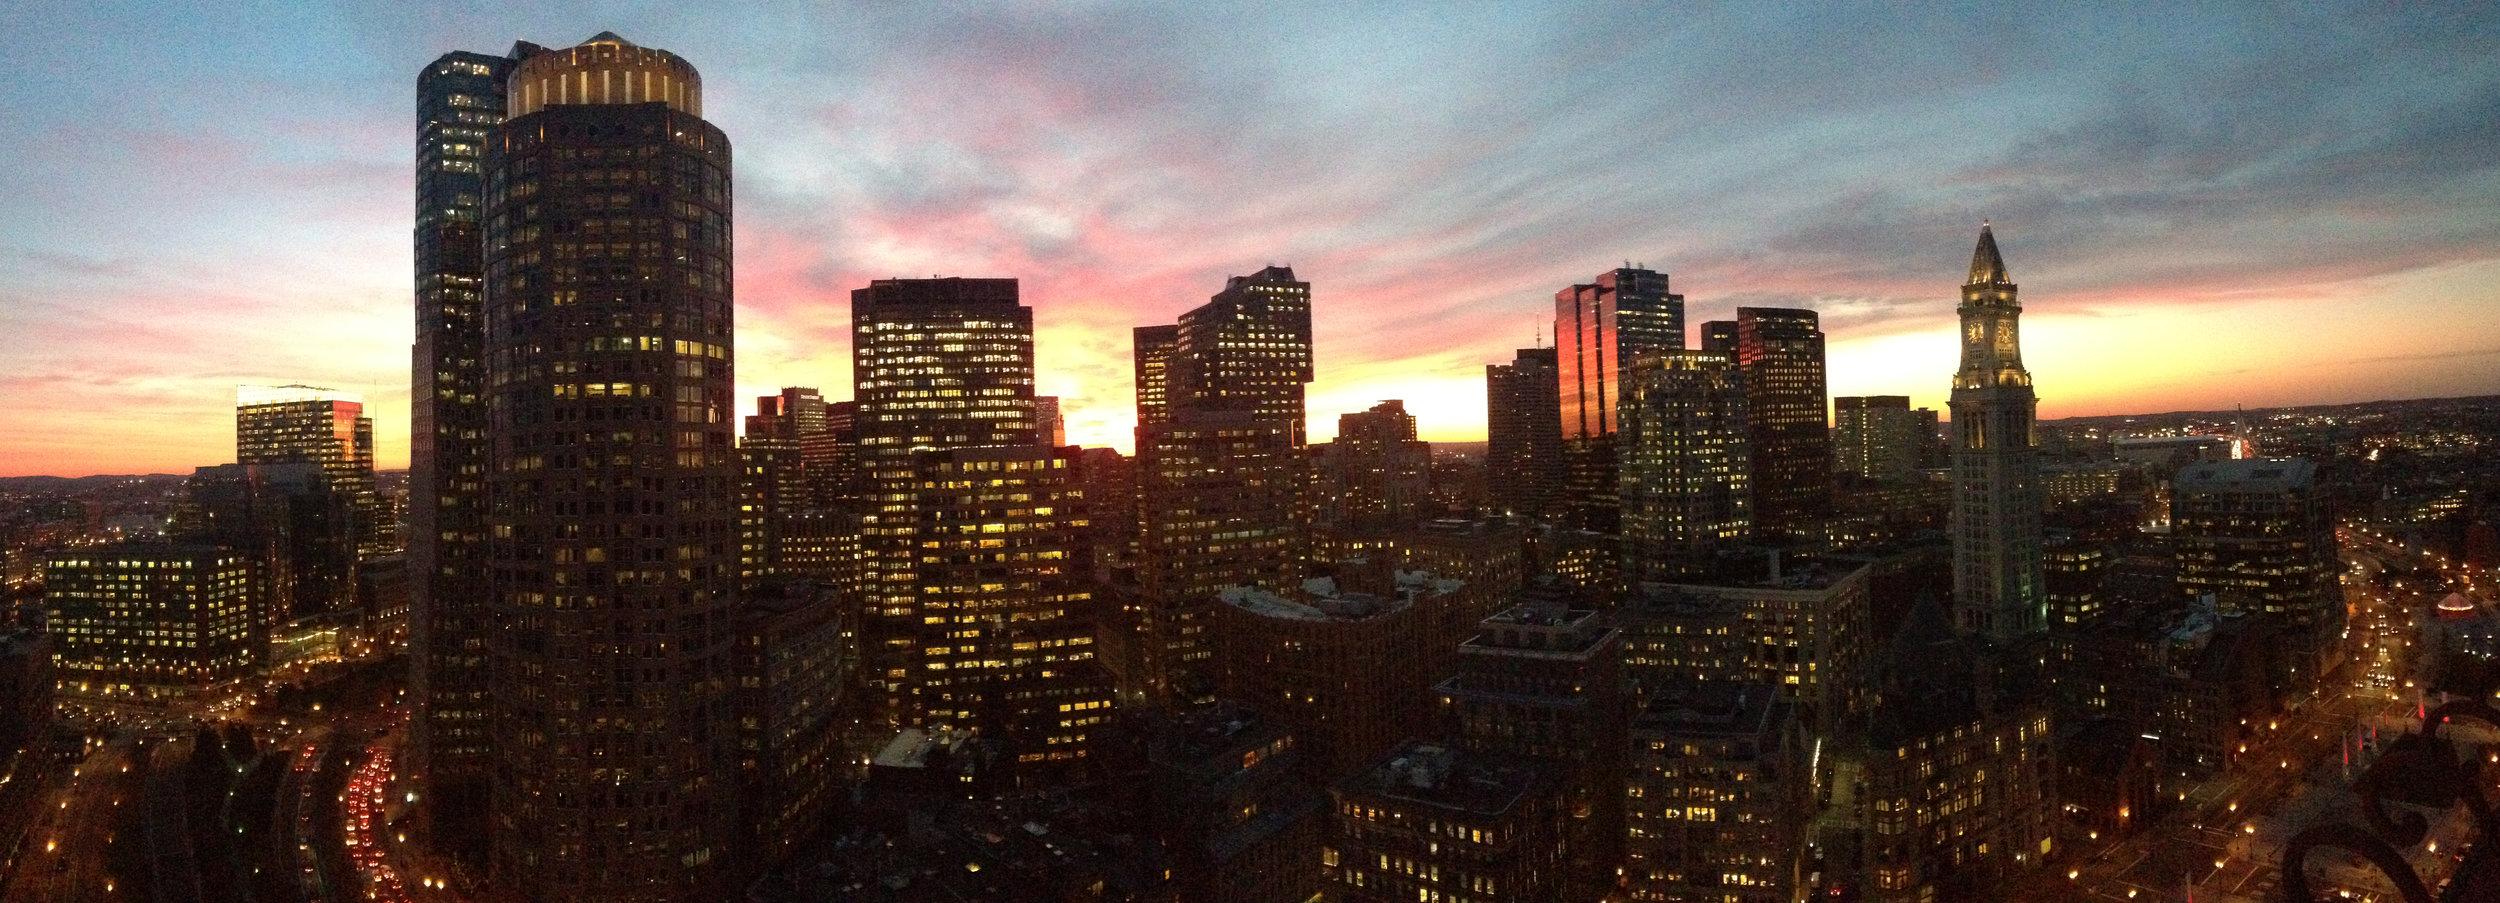 Skyline (Part Two) - Kat Capossela